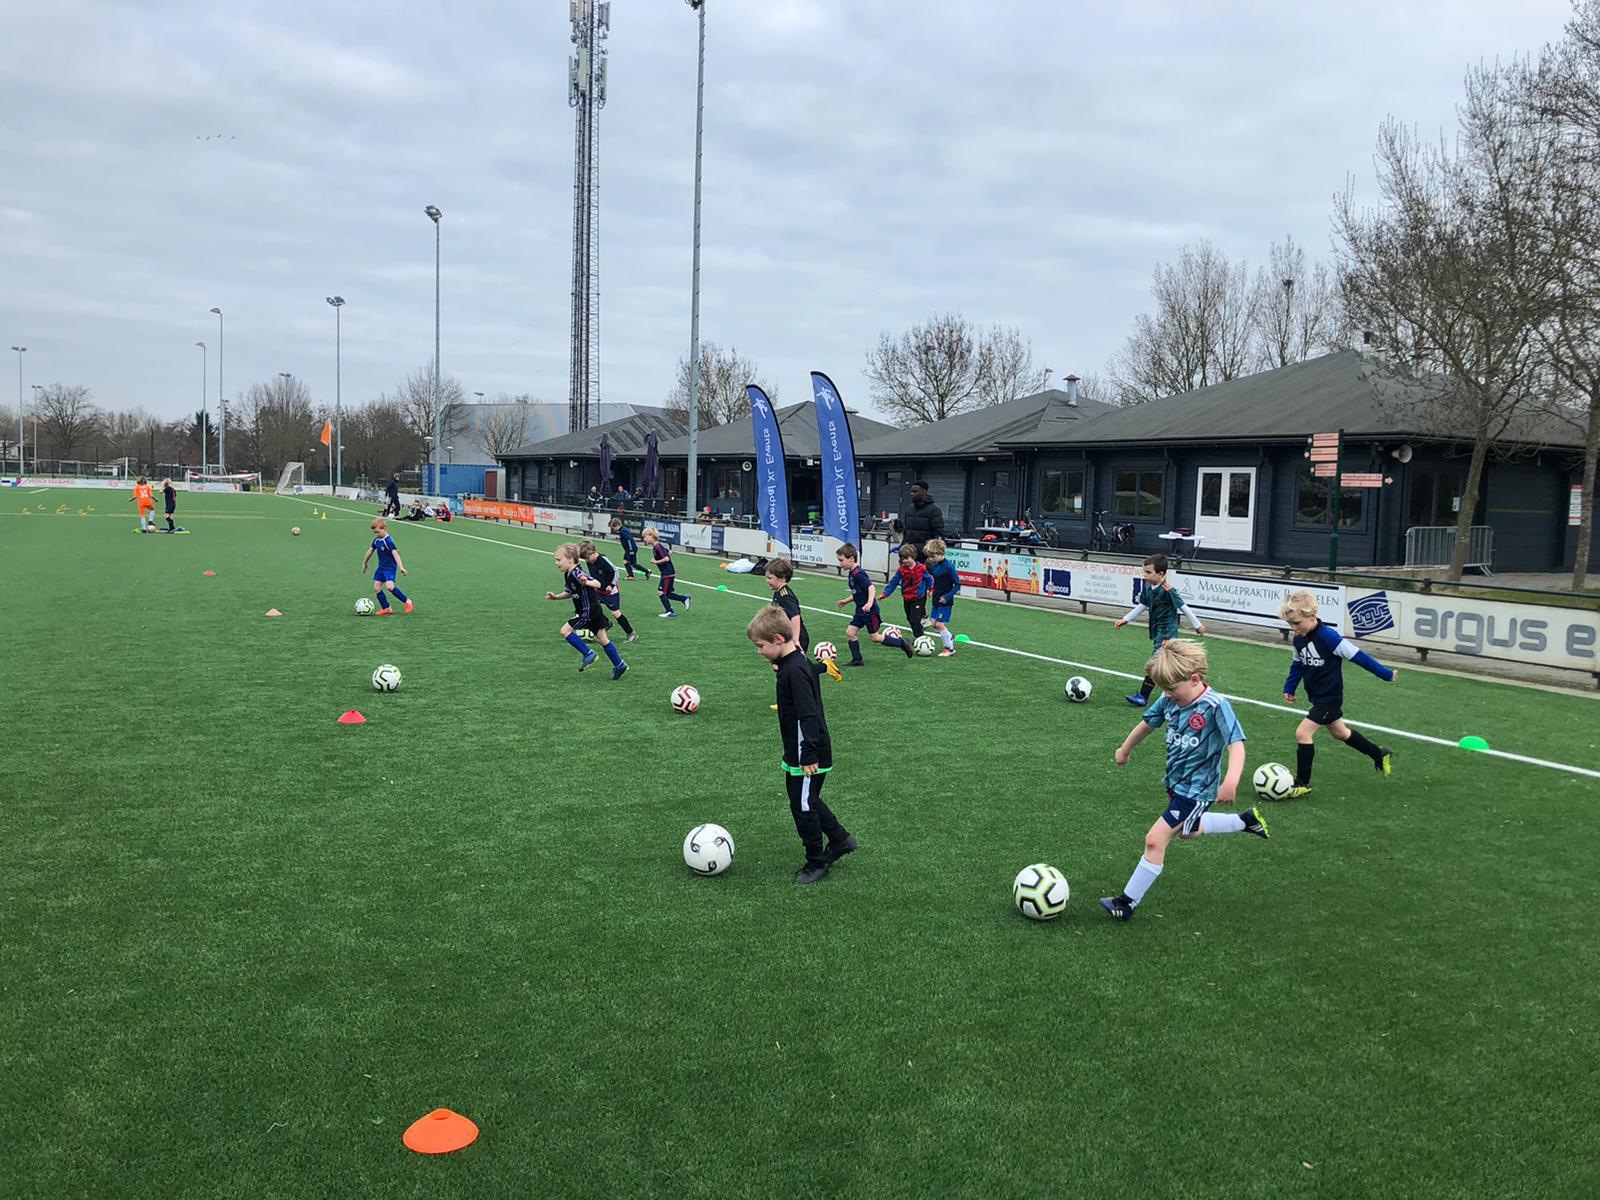 FC Breukelen jeugddagen 22 en 23 februari jl.